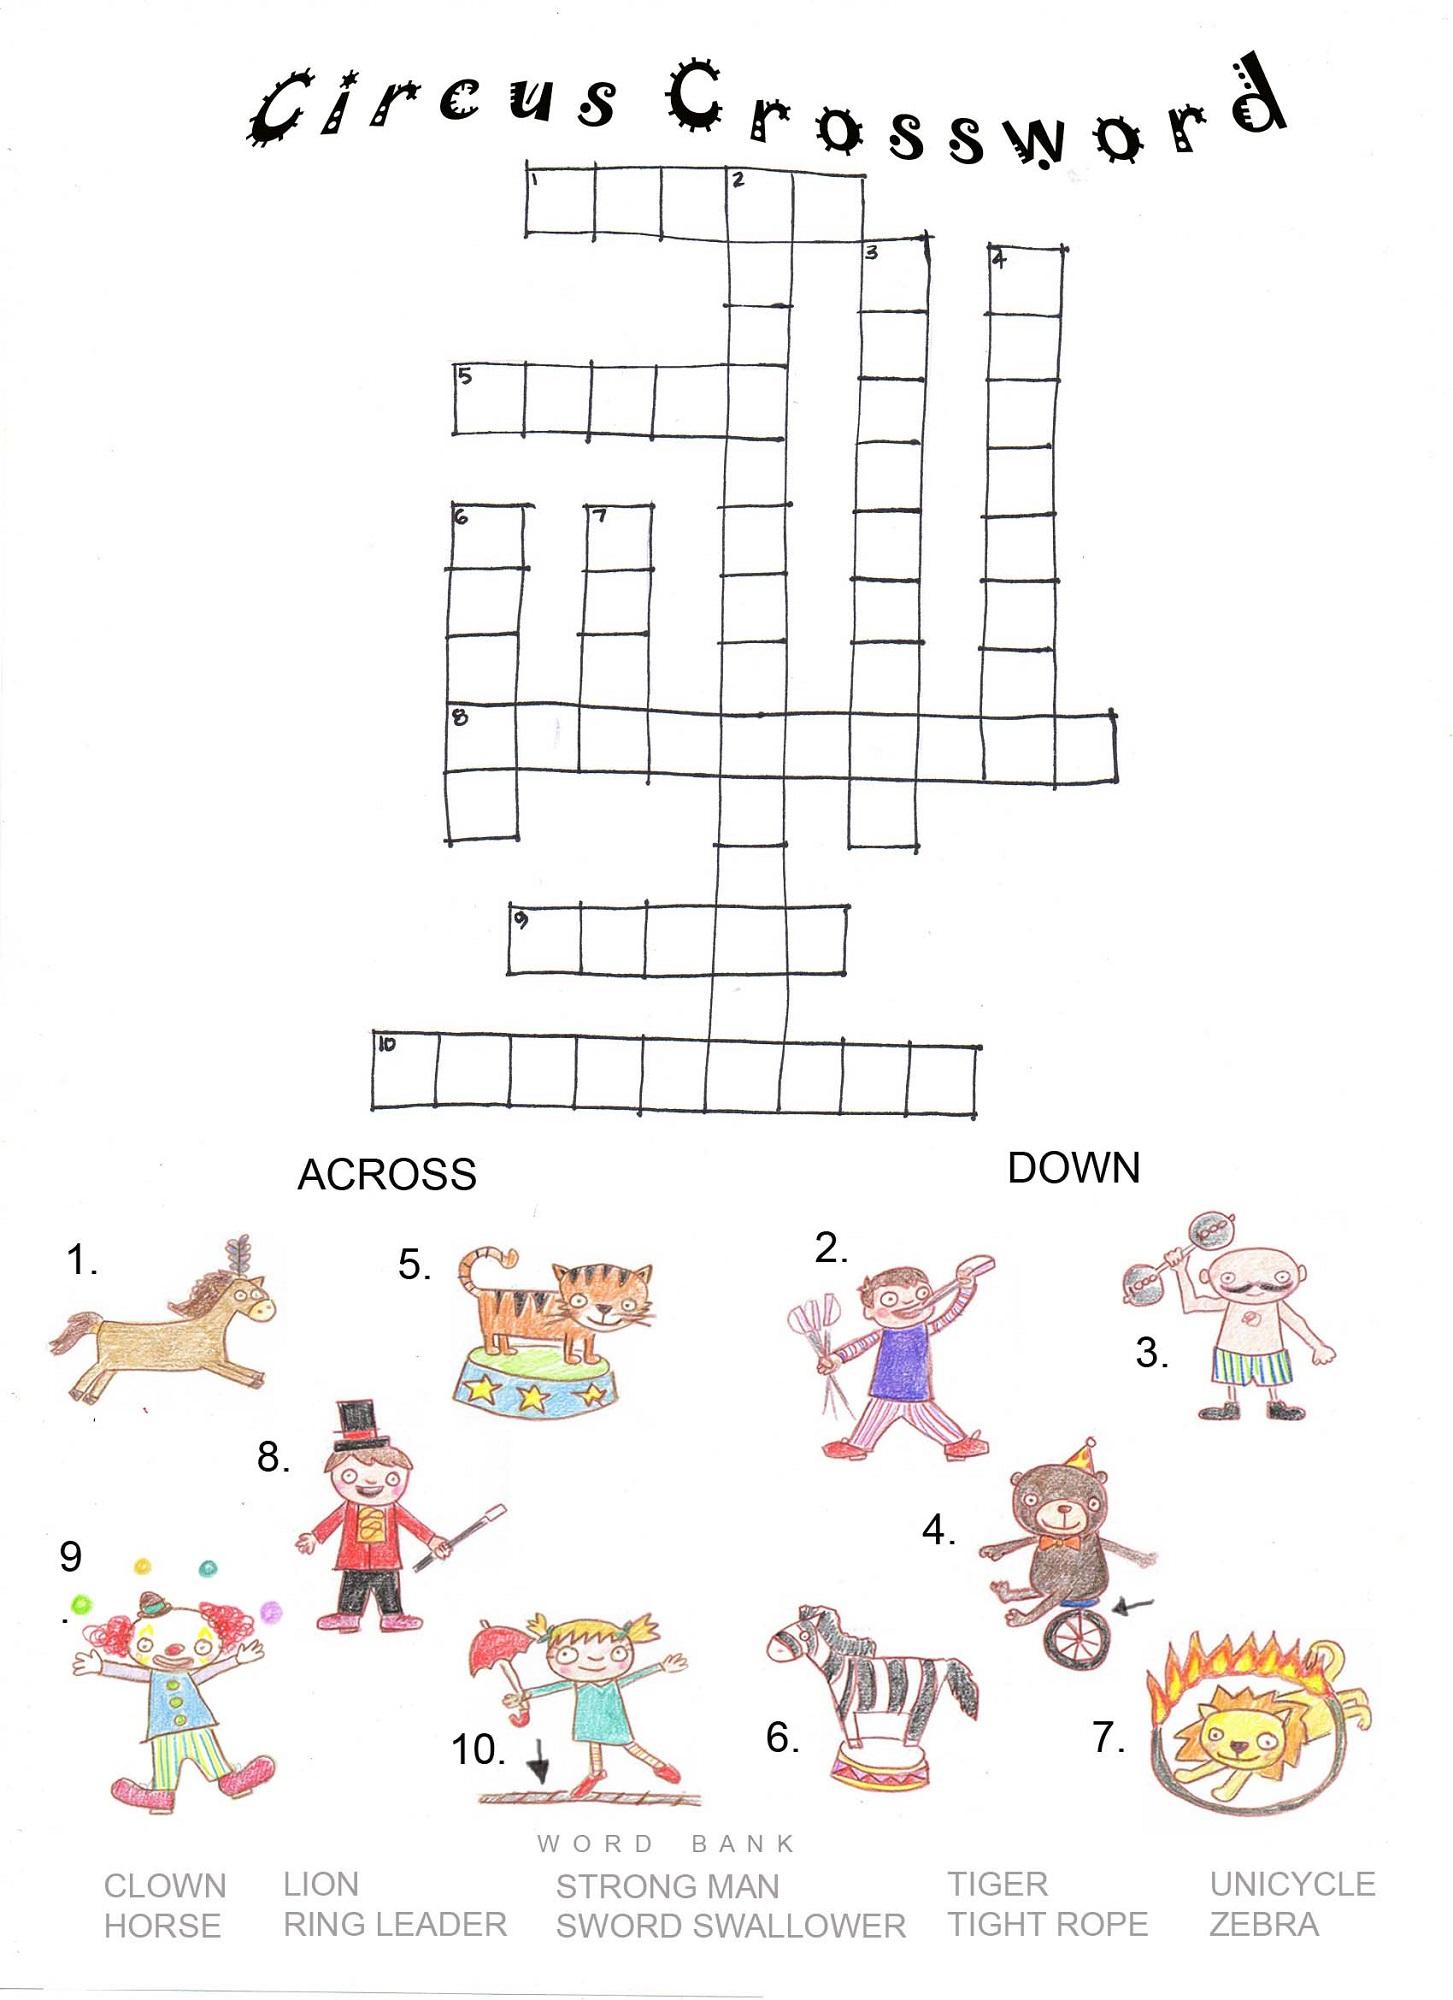 Printable Crosswords Puzzles Kids | Activity Shelter - Printable Crossword Puzzles Horses